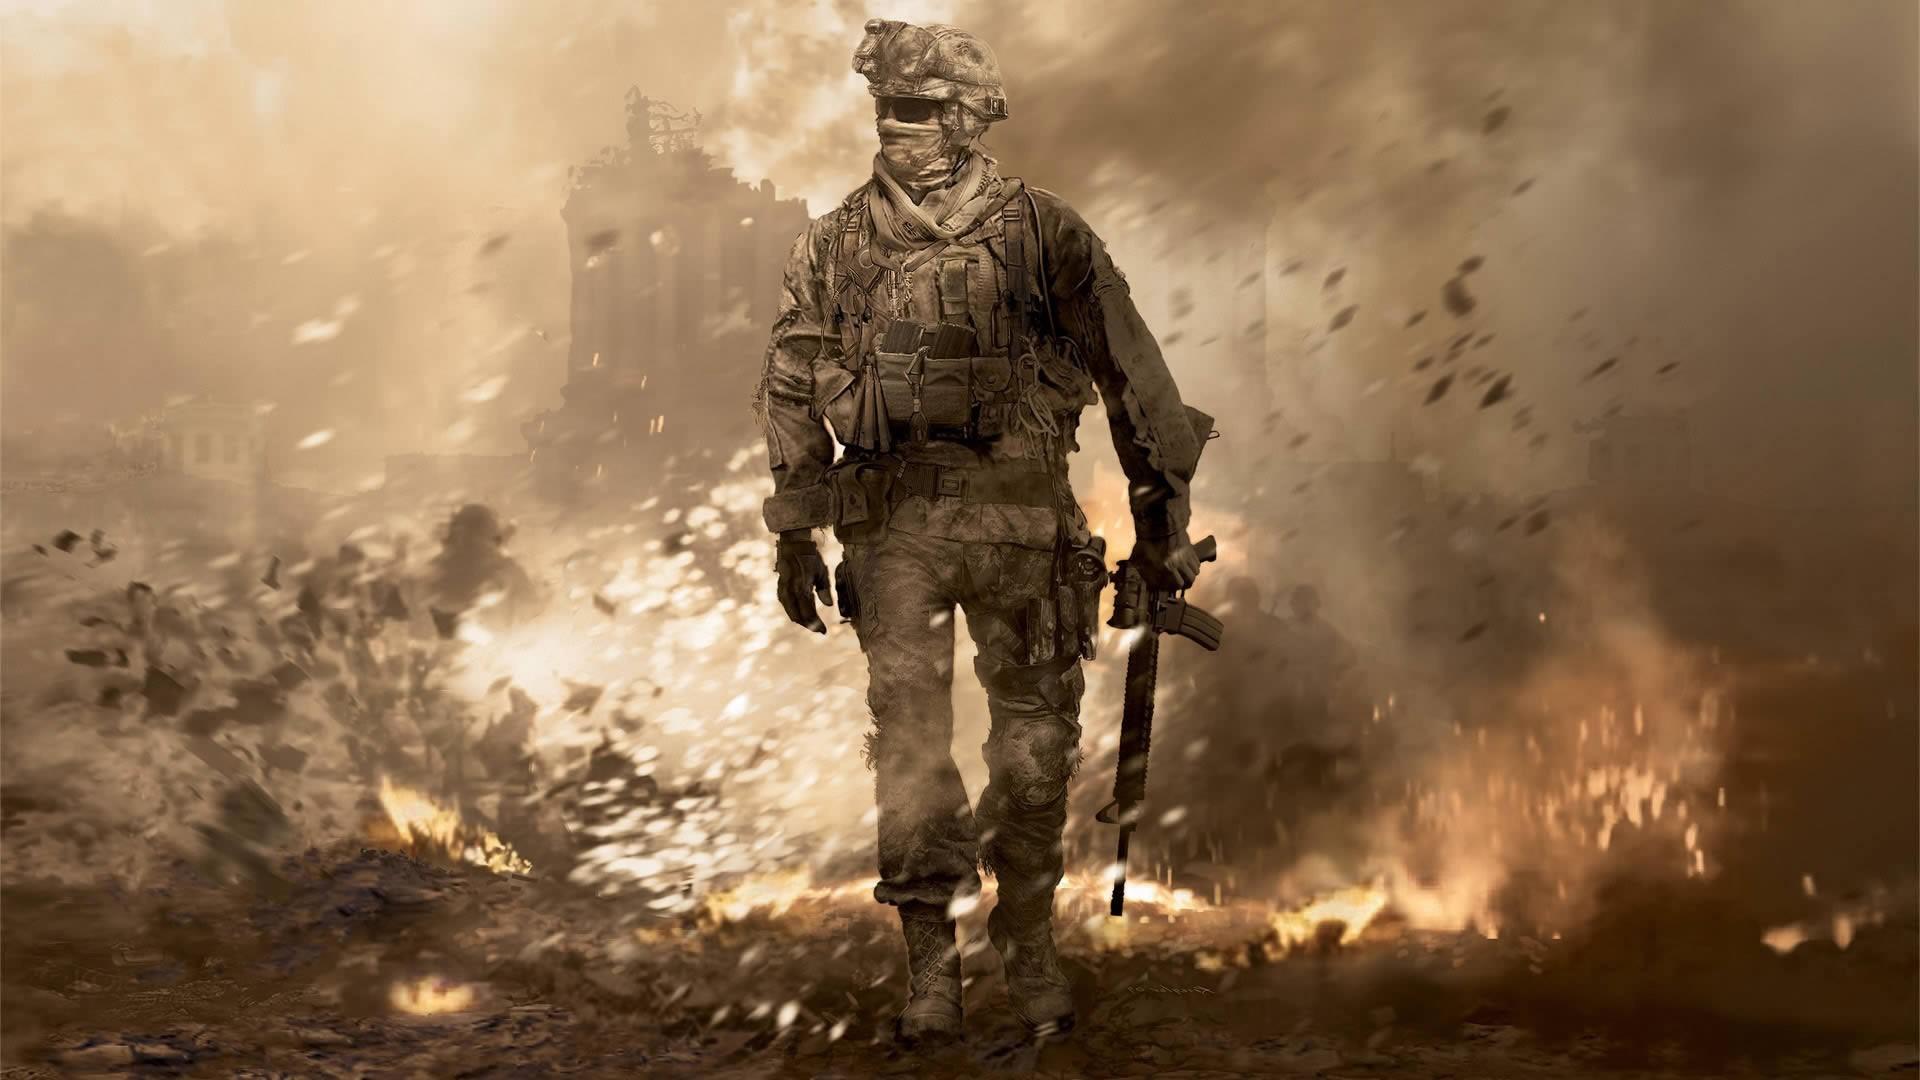 Call Of Duty Modern Warfare 2 Wallpaper 1920x1080 78799